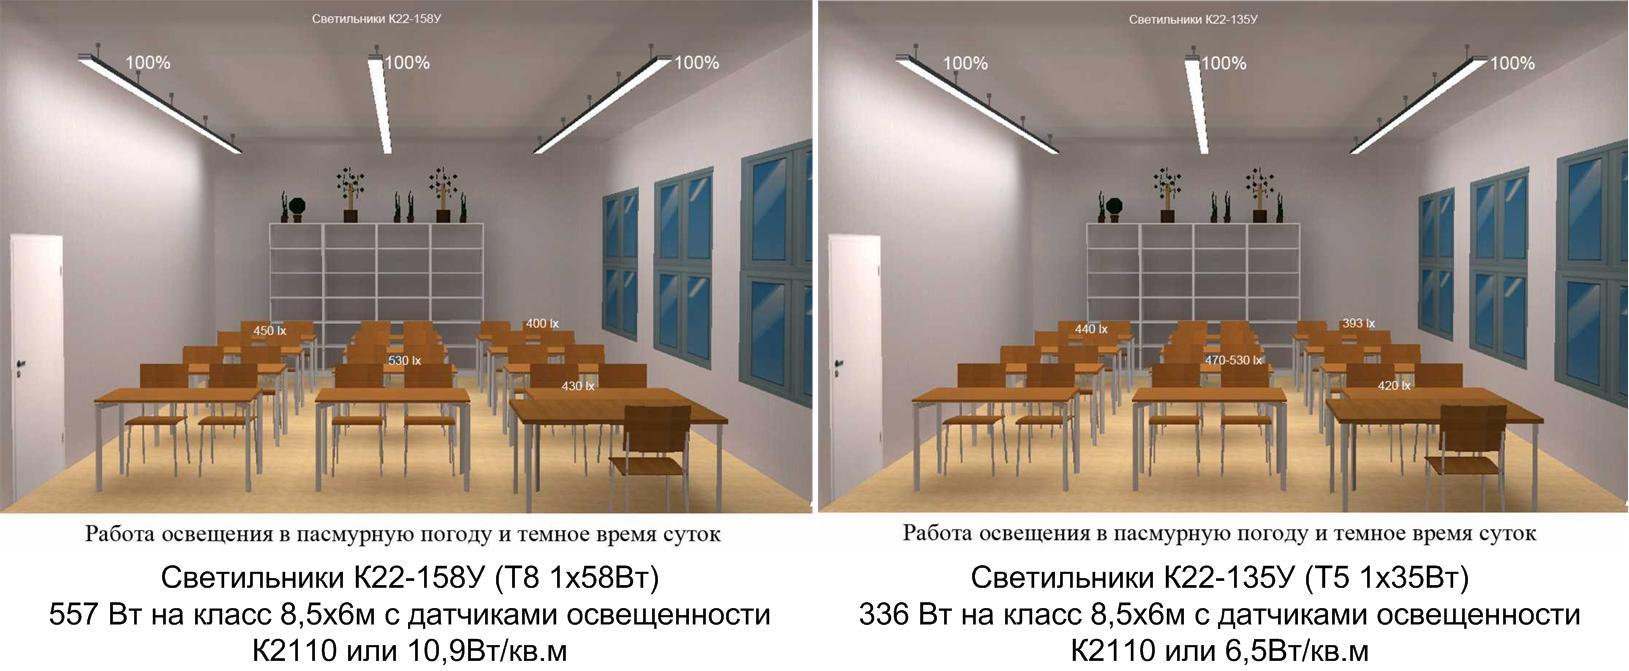 osw_klass_58_25w.jpg